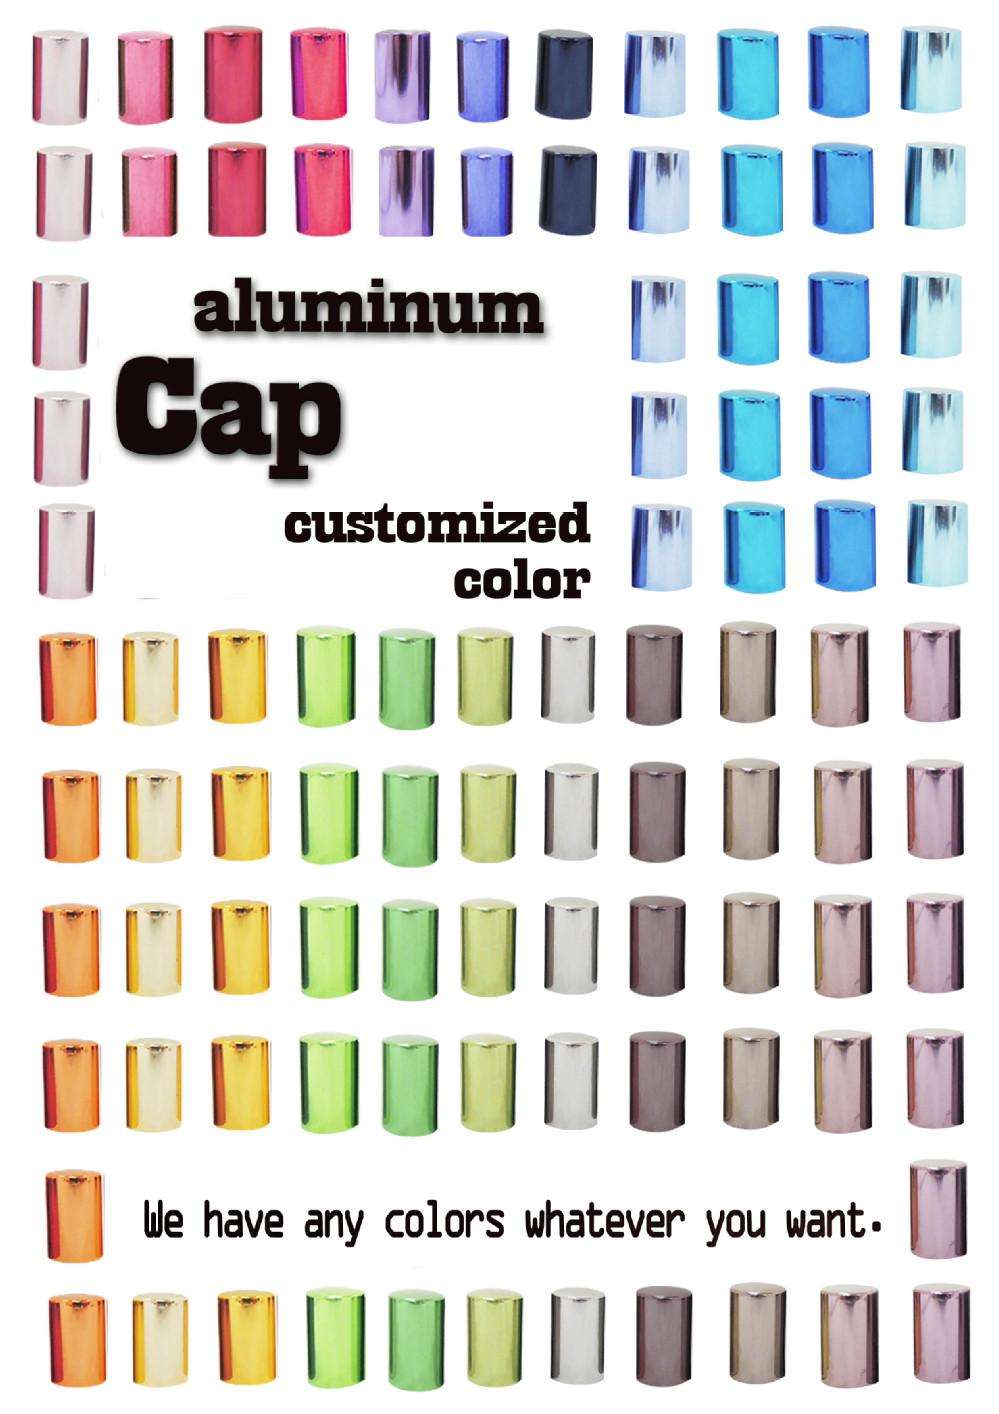 cap color  customized.jpg